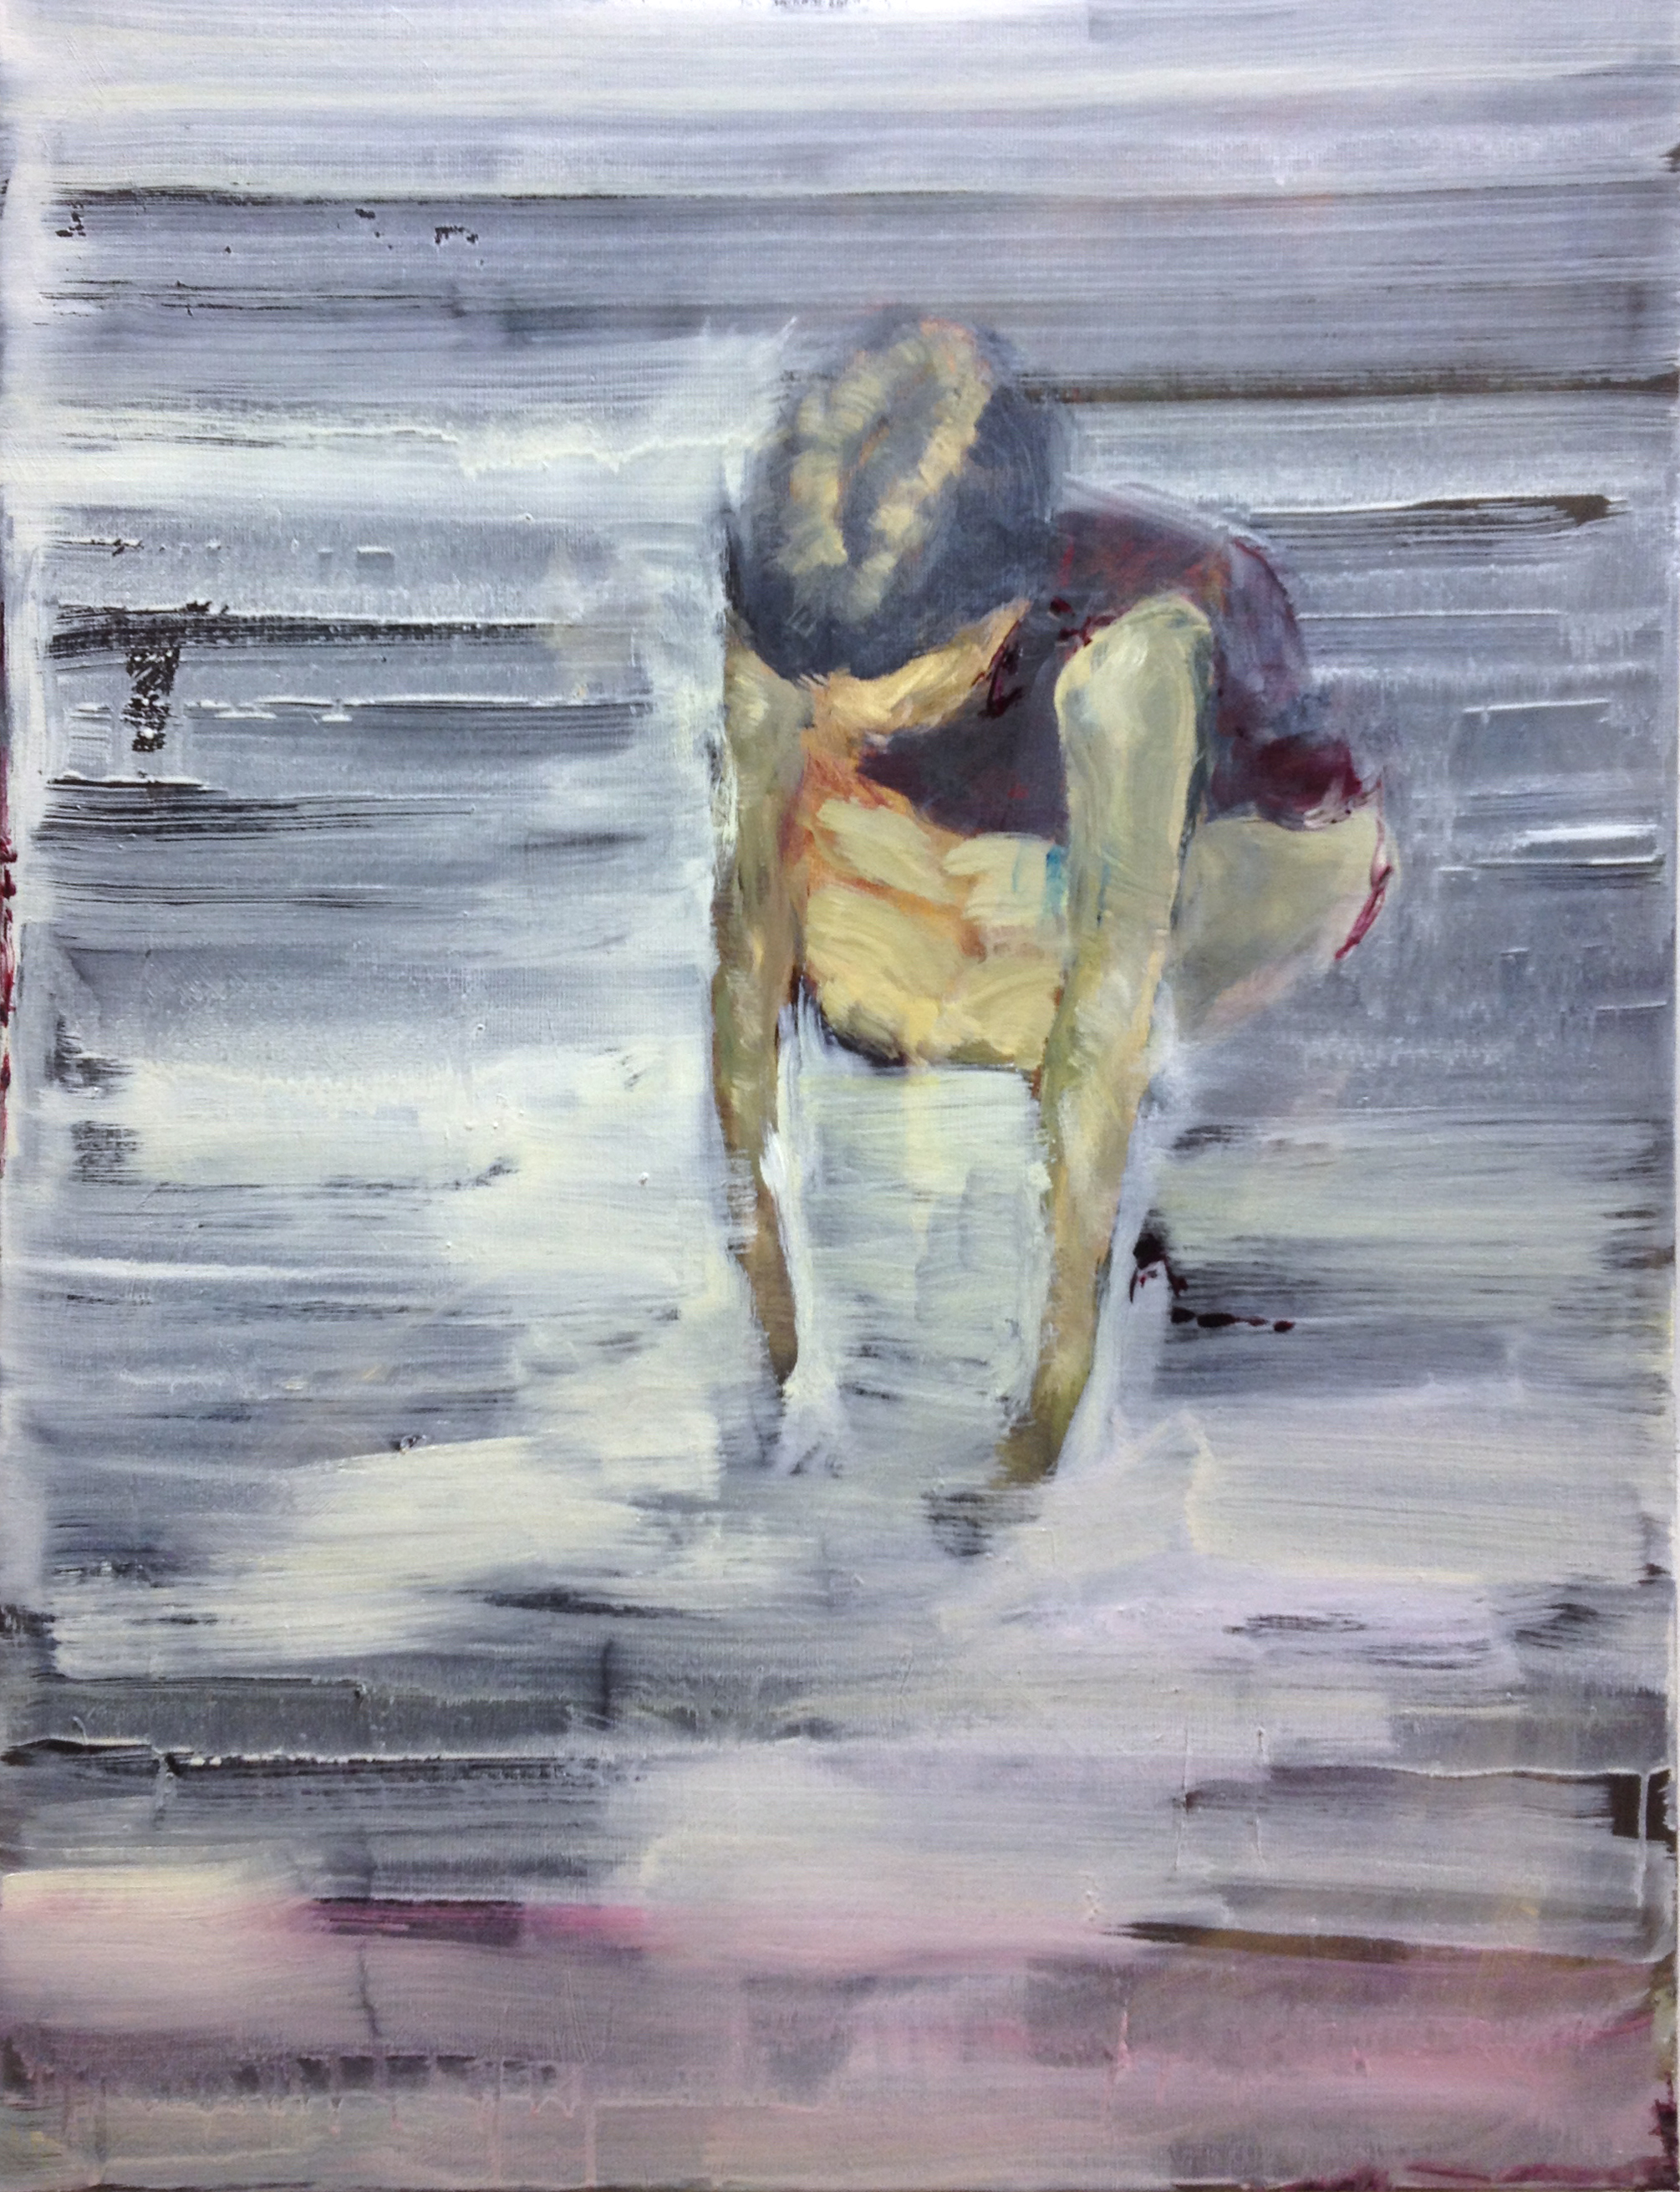 Le Repos, 60 x 80 cm, oil on canvas